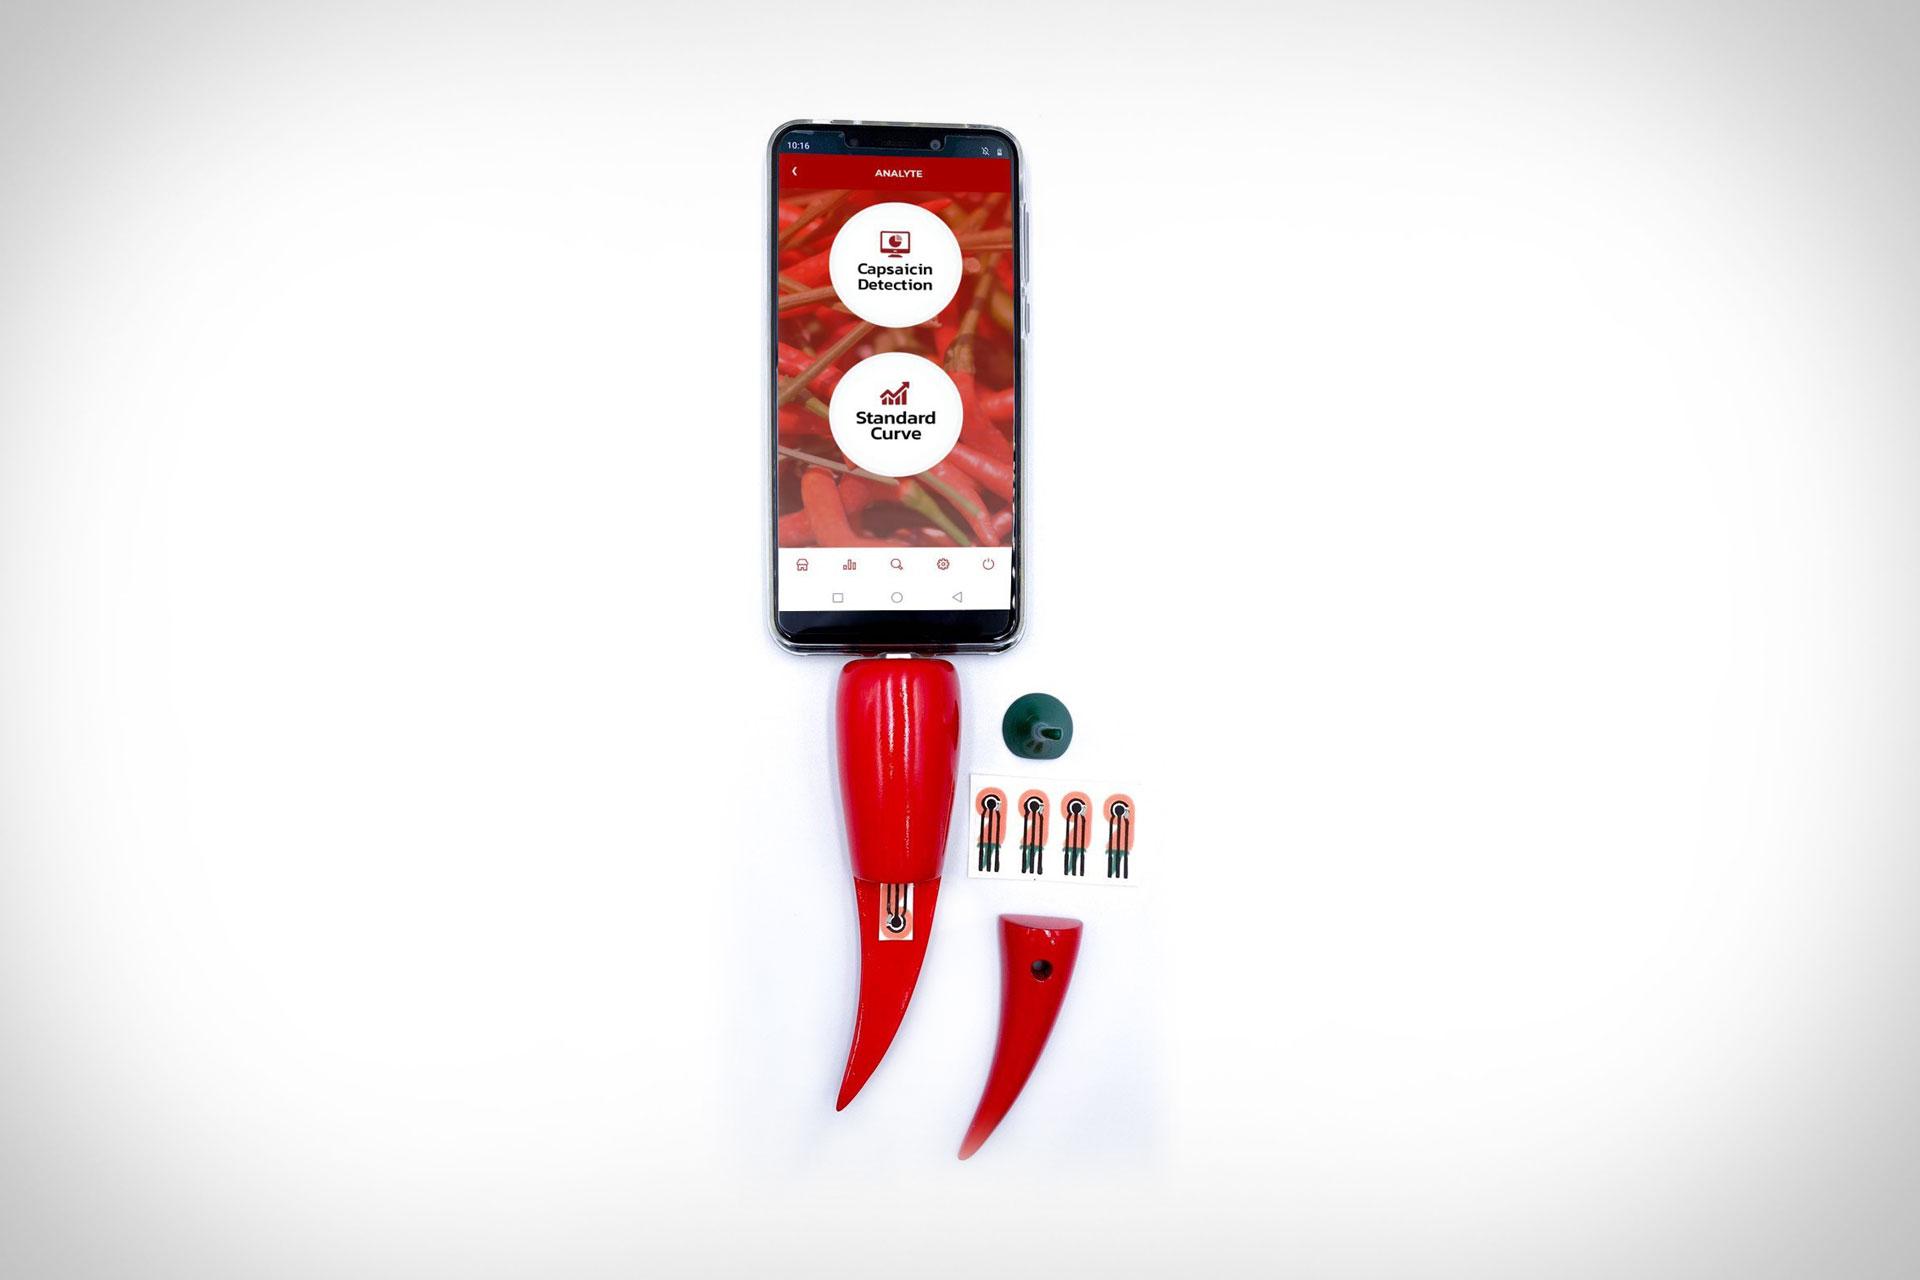 Chili Pepper Capsaicin Detector